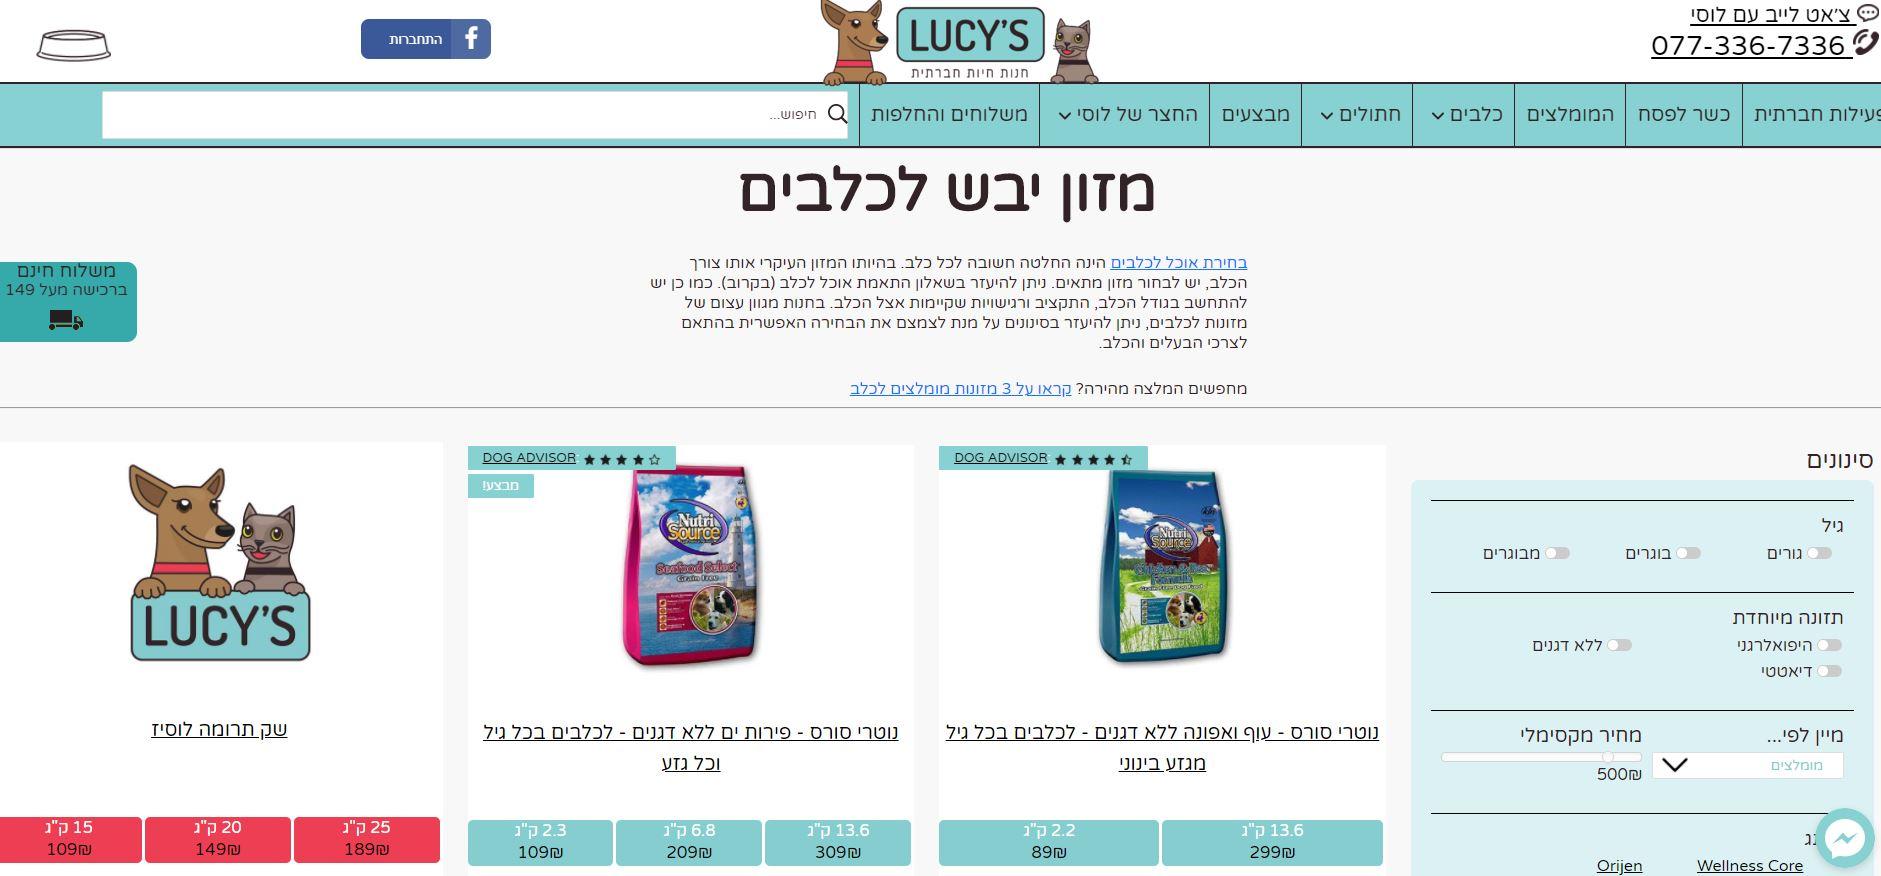 lucys.co.il